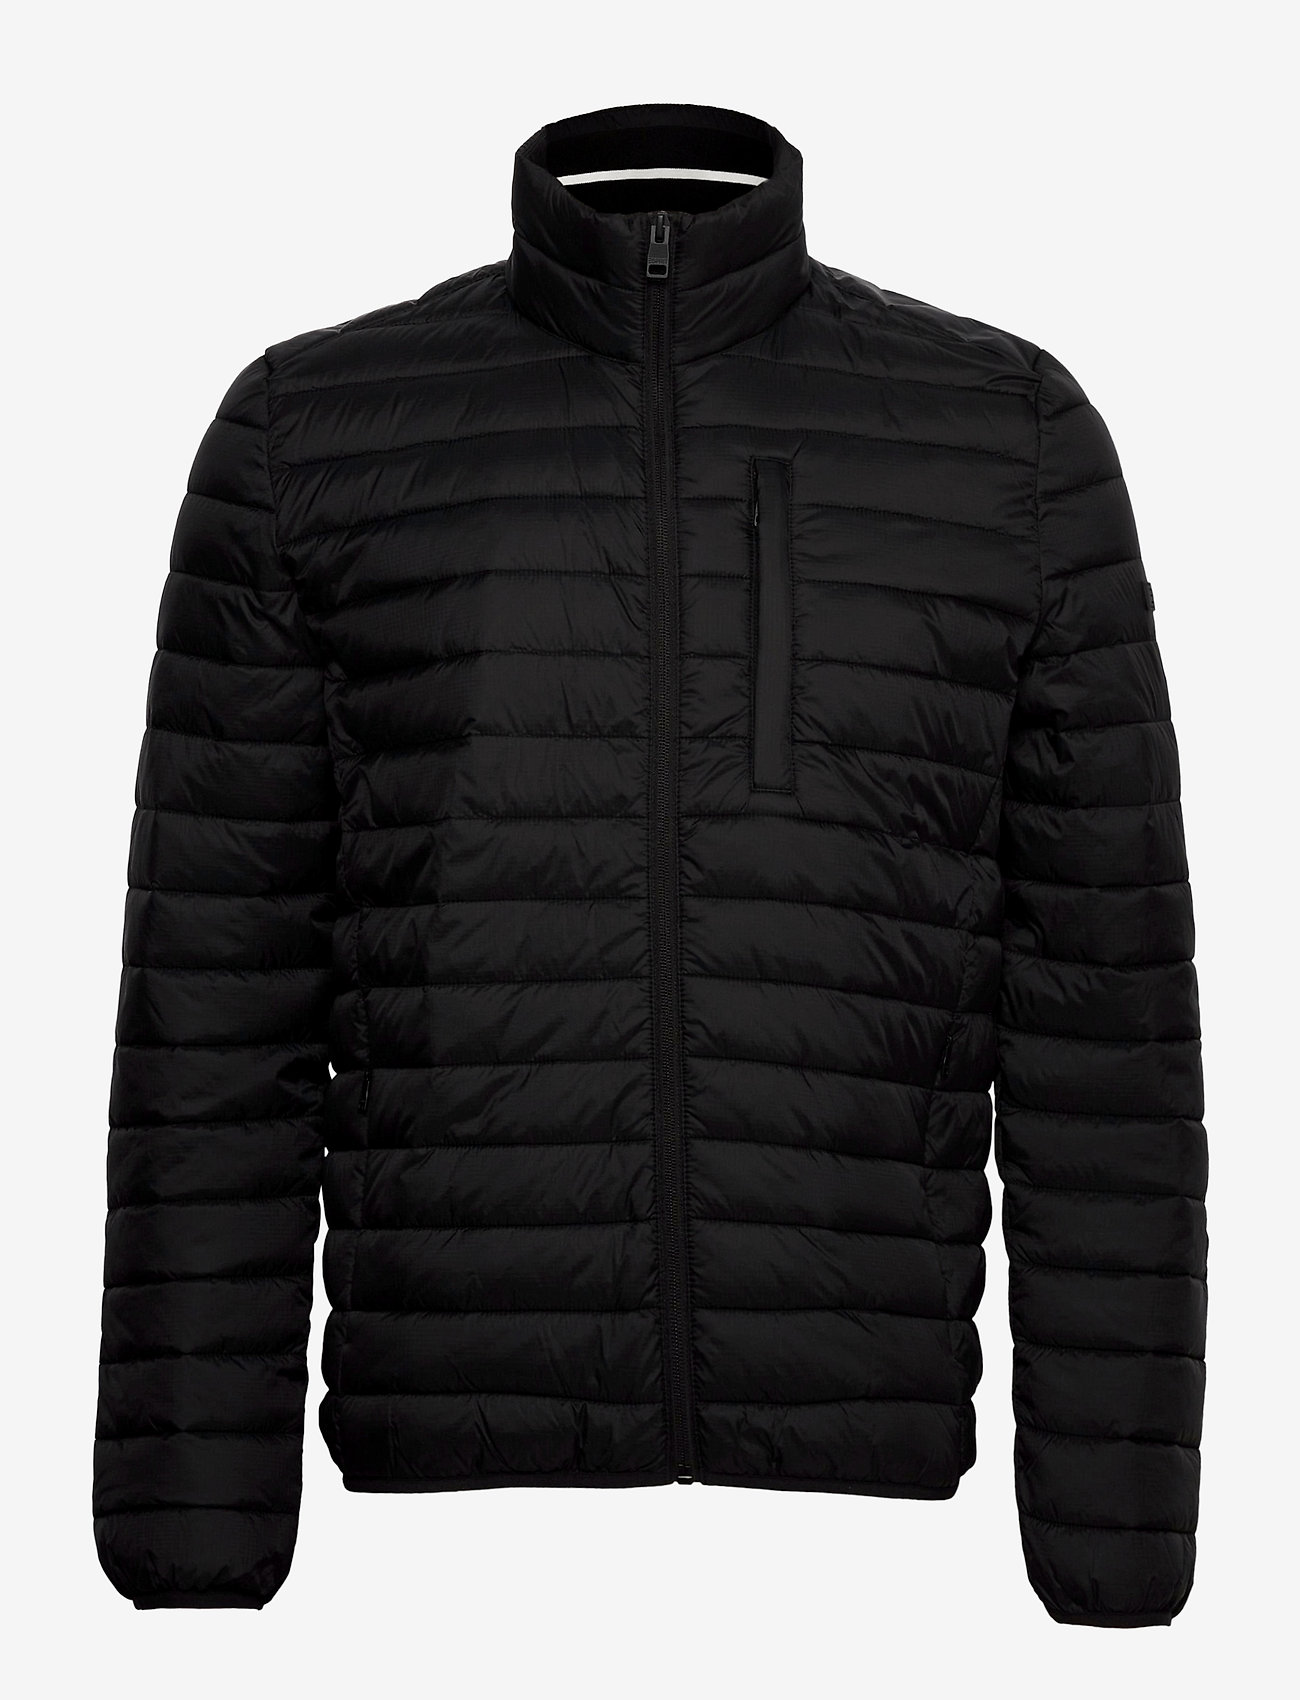 Esprit Casual - Jackets outdoor woven - donsjassen - black - 1